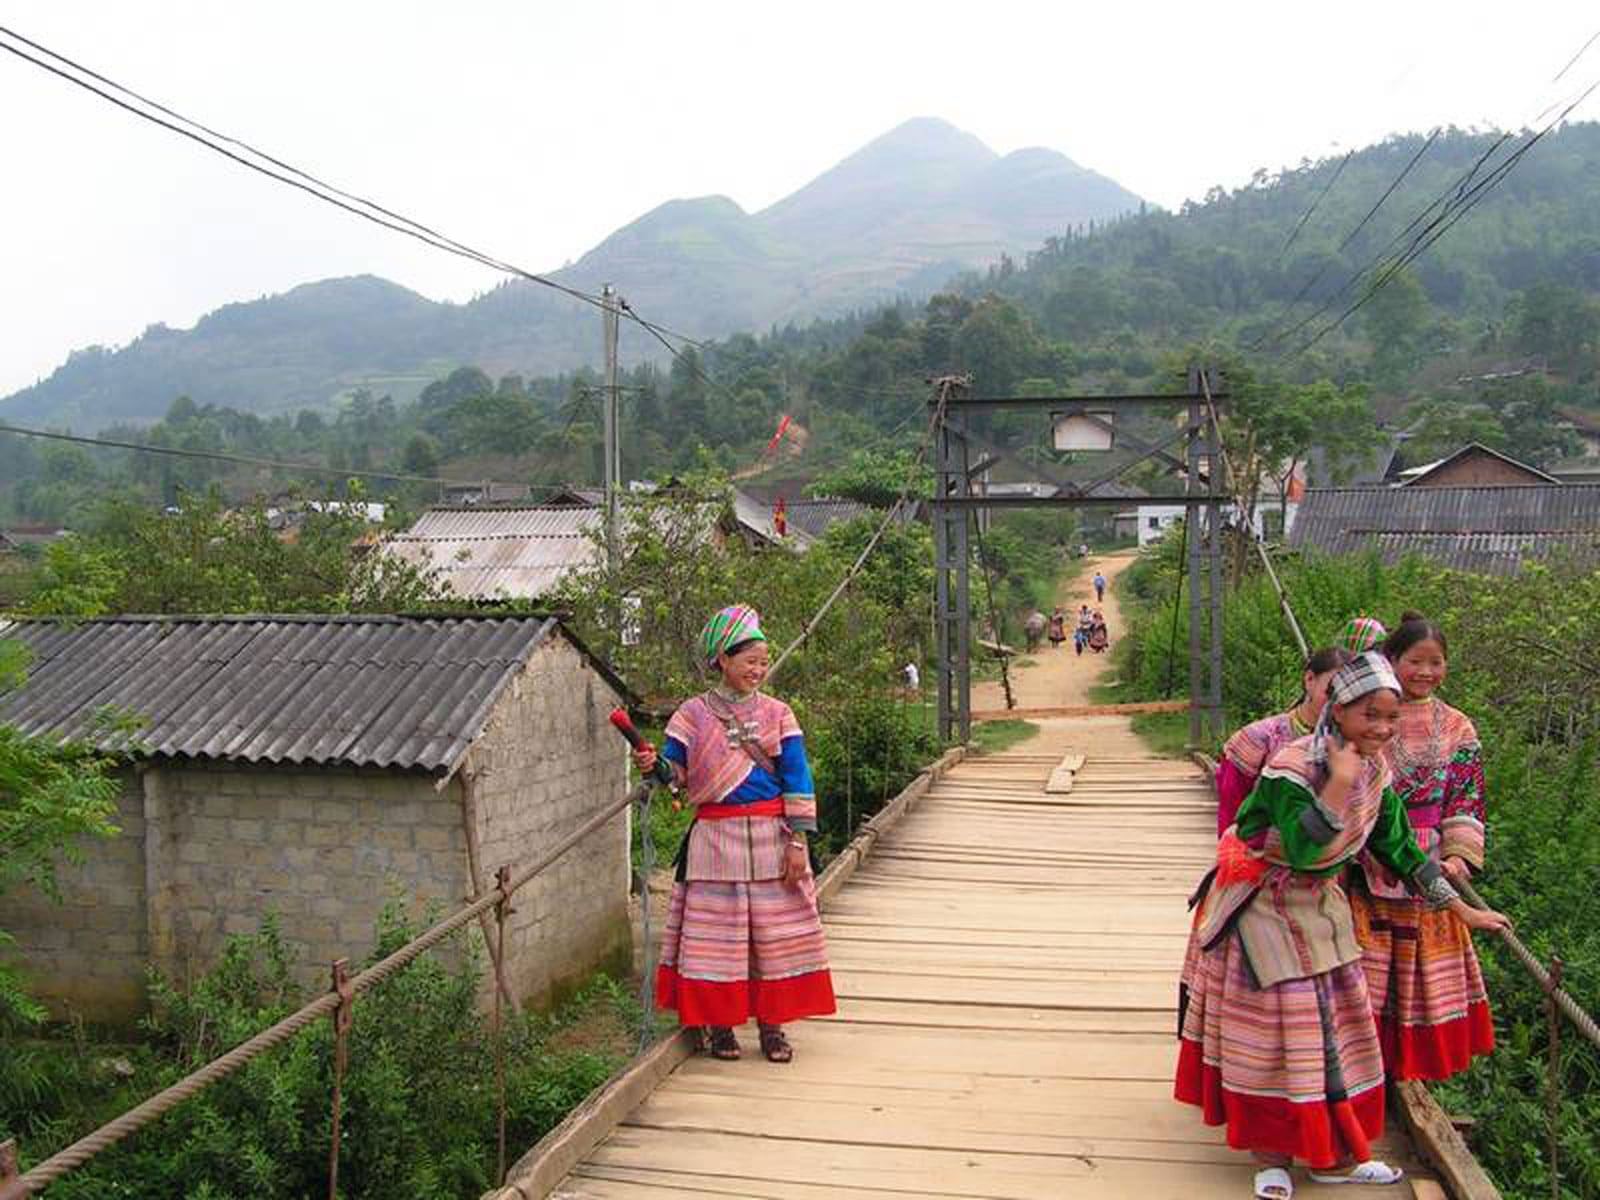 rondreis vietnam sapa hoogtepunt 3